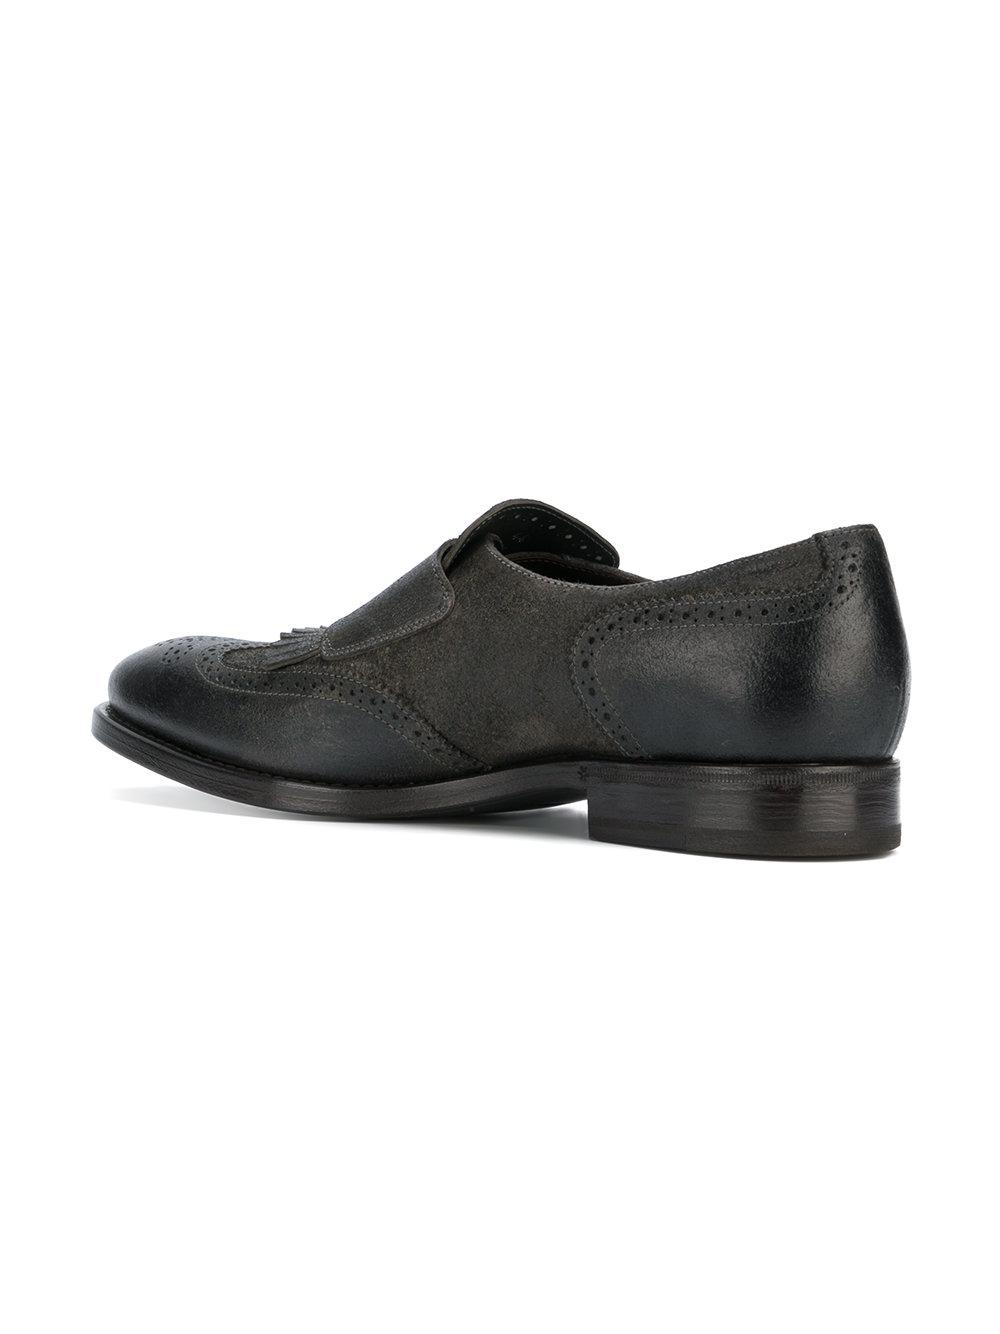 HENDERSON BARACCOMonk shoes 50401 suede fringes g8pRTk9AGc